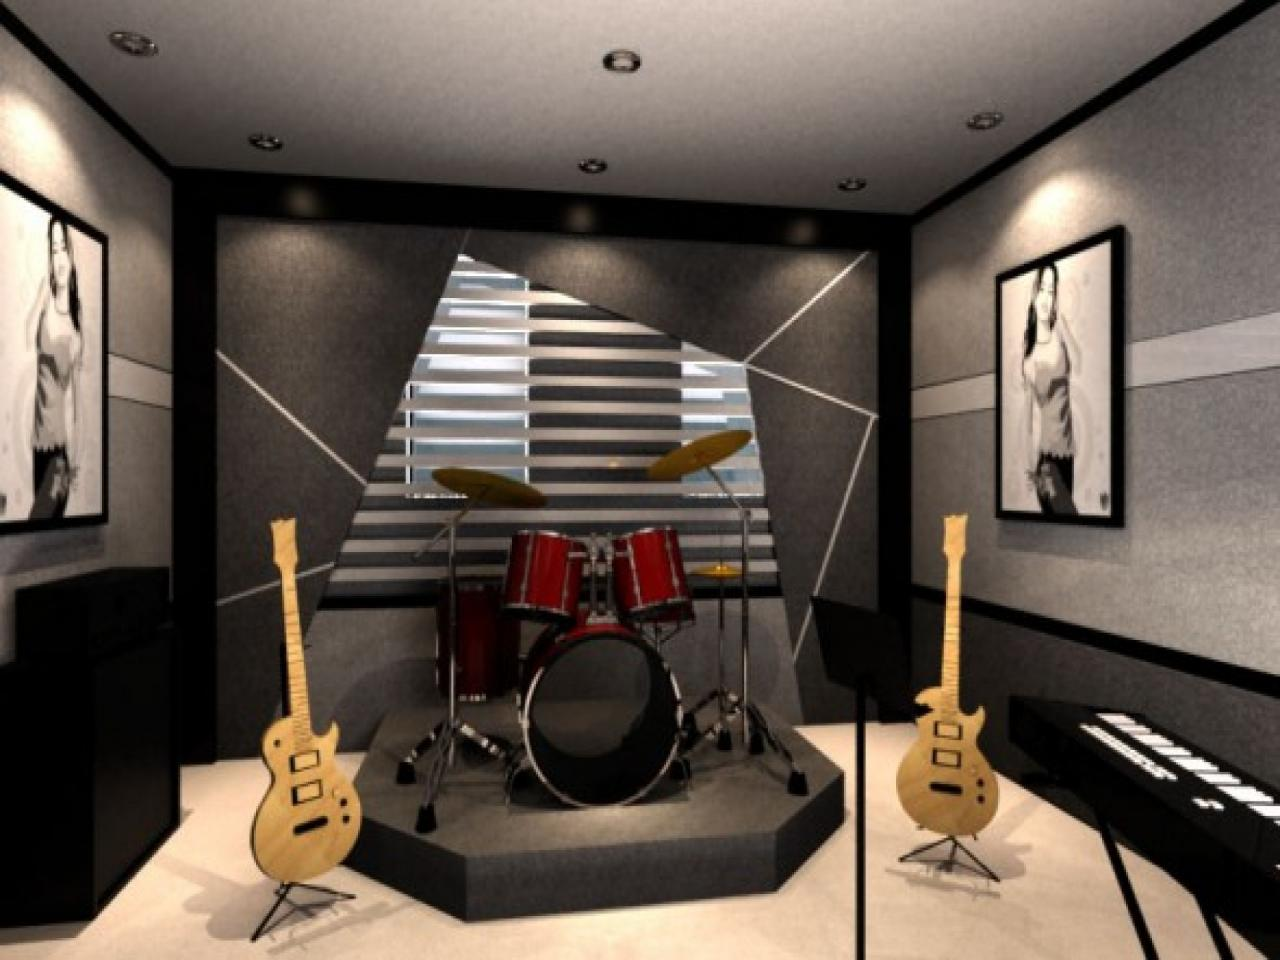 1920x1440 1920x1440 Small Minimalist Of Home Music Studio Ideas Room Excerpt Rustic  Interior Design Free. interior ...